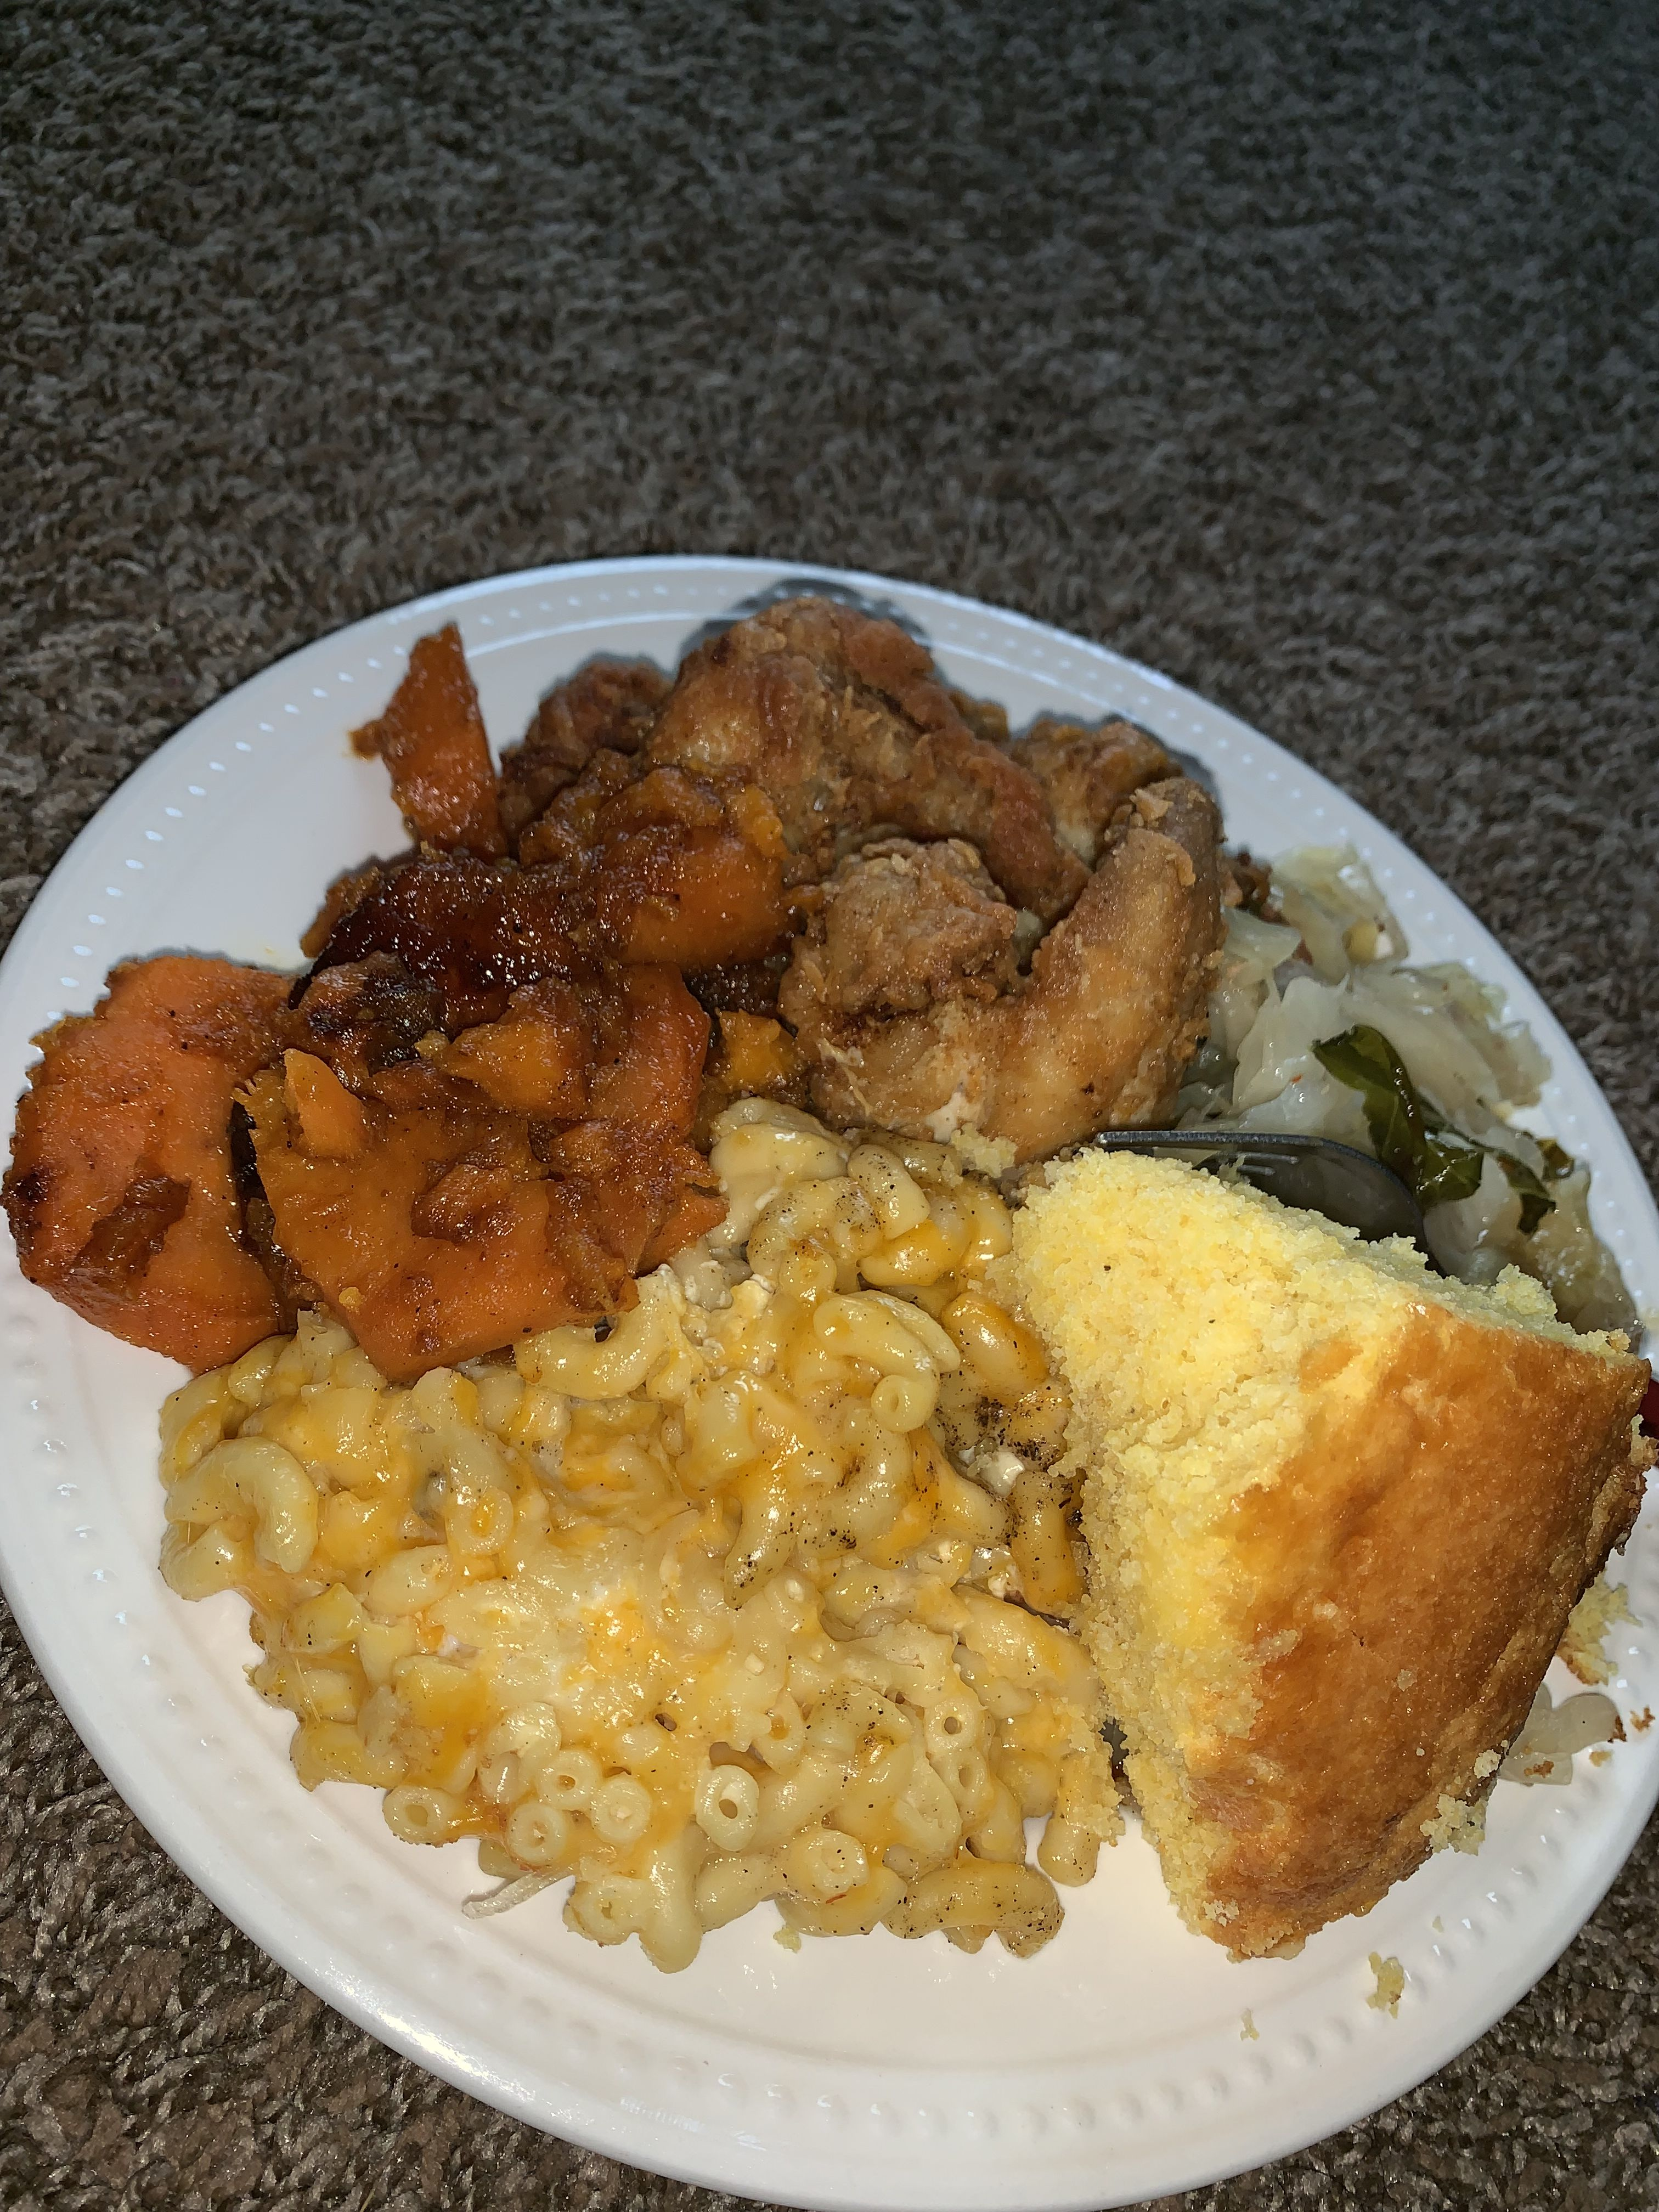 Soulfood Sunday 🤤 Mac, yams, chicken, cabbage, corn bread